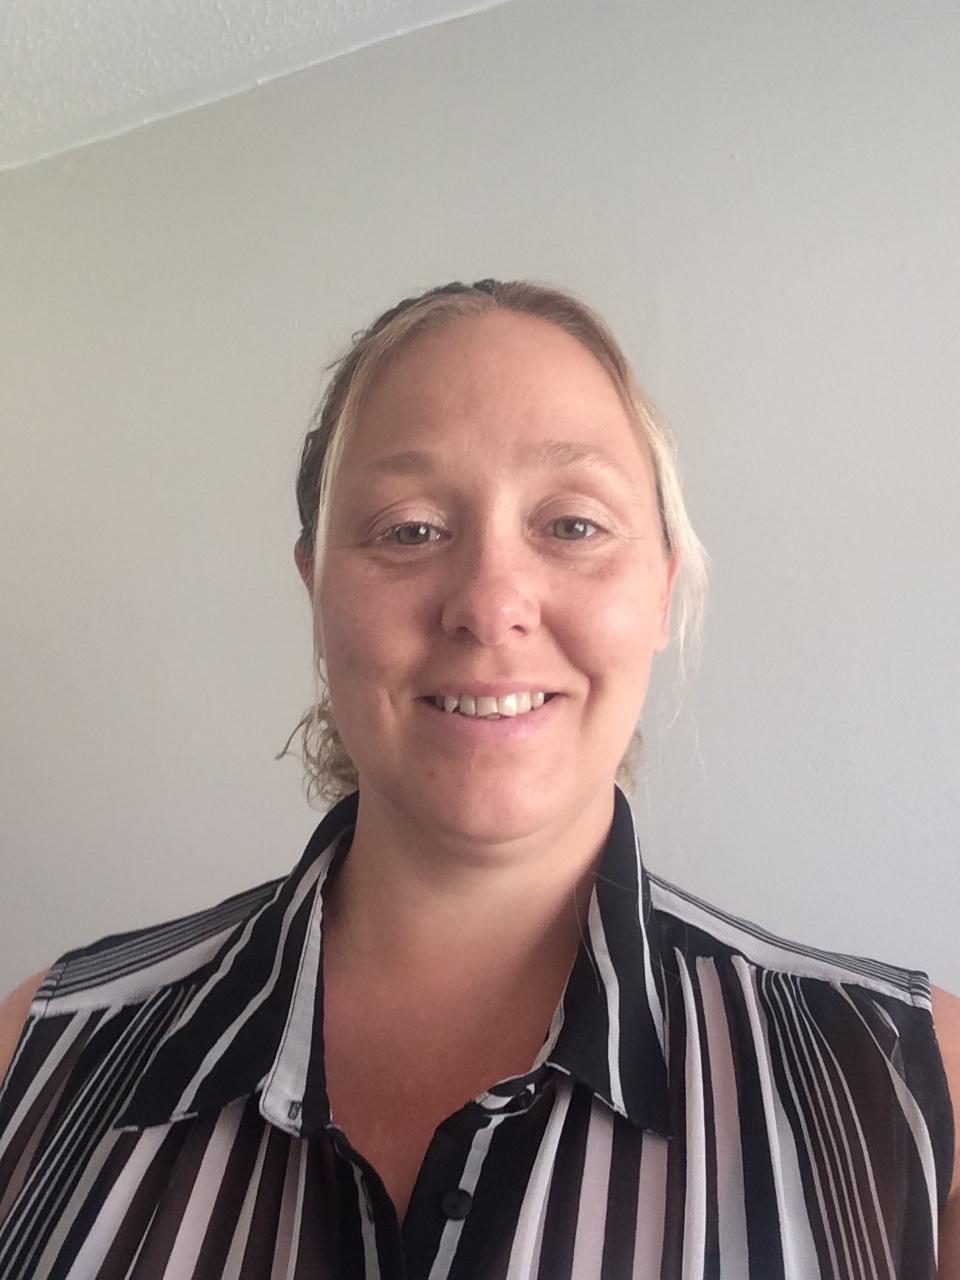 Cheryl Martin, Ashdown Nursery Manager